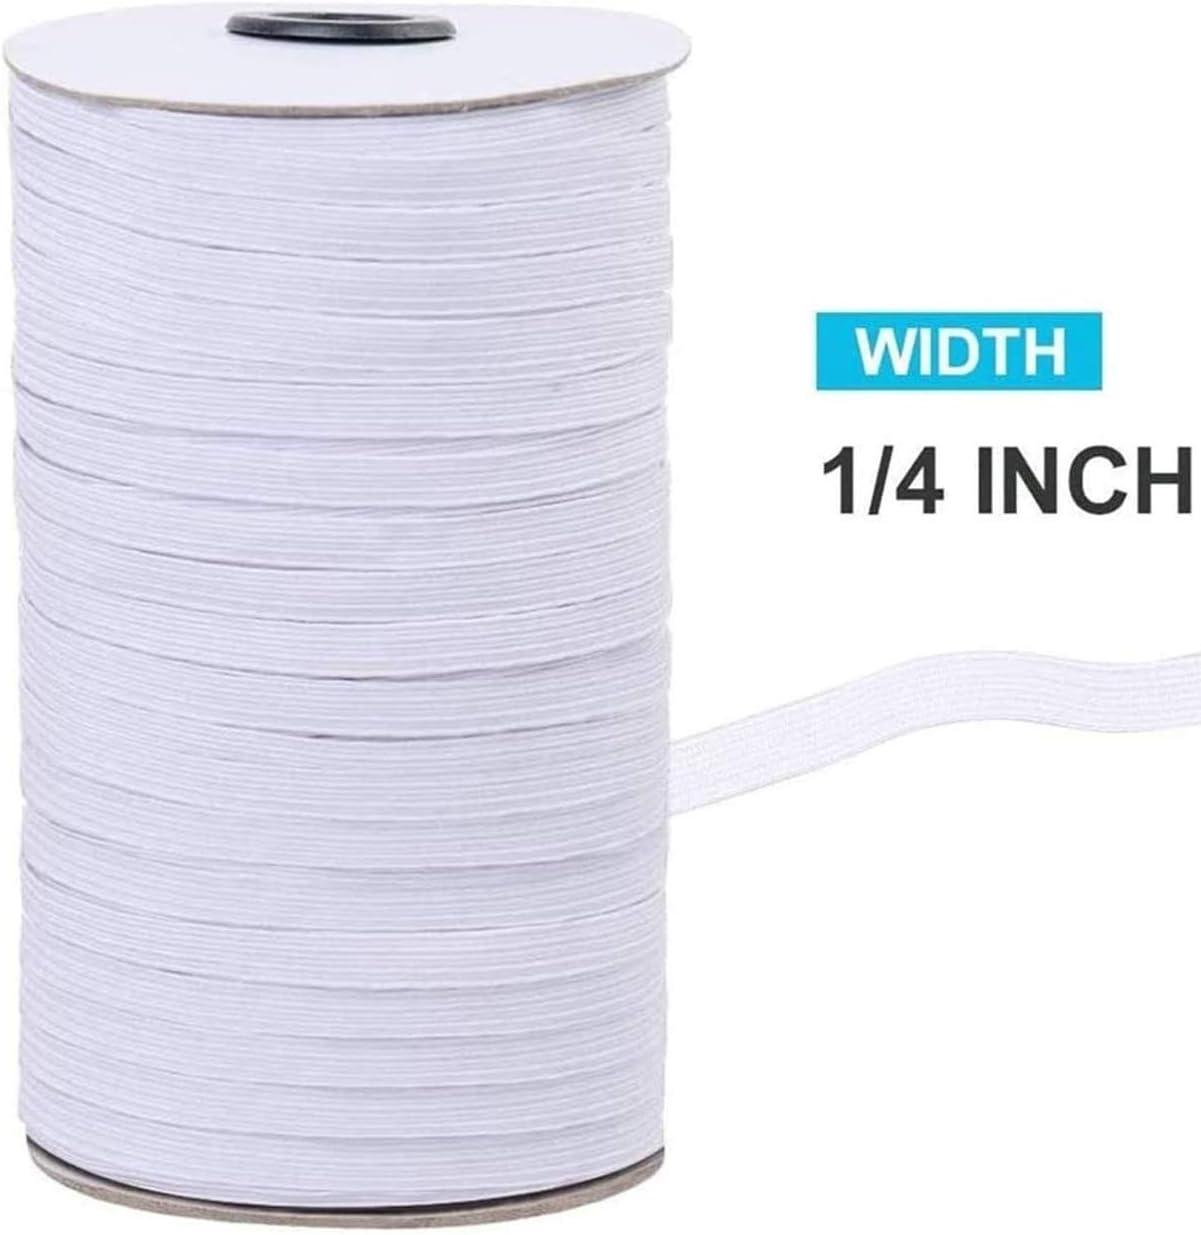 Elastic Band for Sewing Elastic Cord Braided Elastic Rope Elastic Spool Elastic String High Elasticity Knit Heavy Stretch for Sewing Crafts DIY Bedspread Cuff White, 1//4 inch 6mm 200 Yard